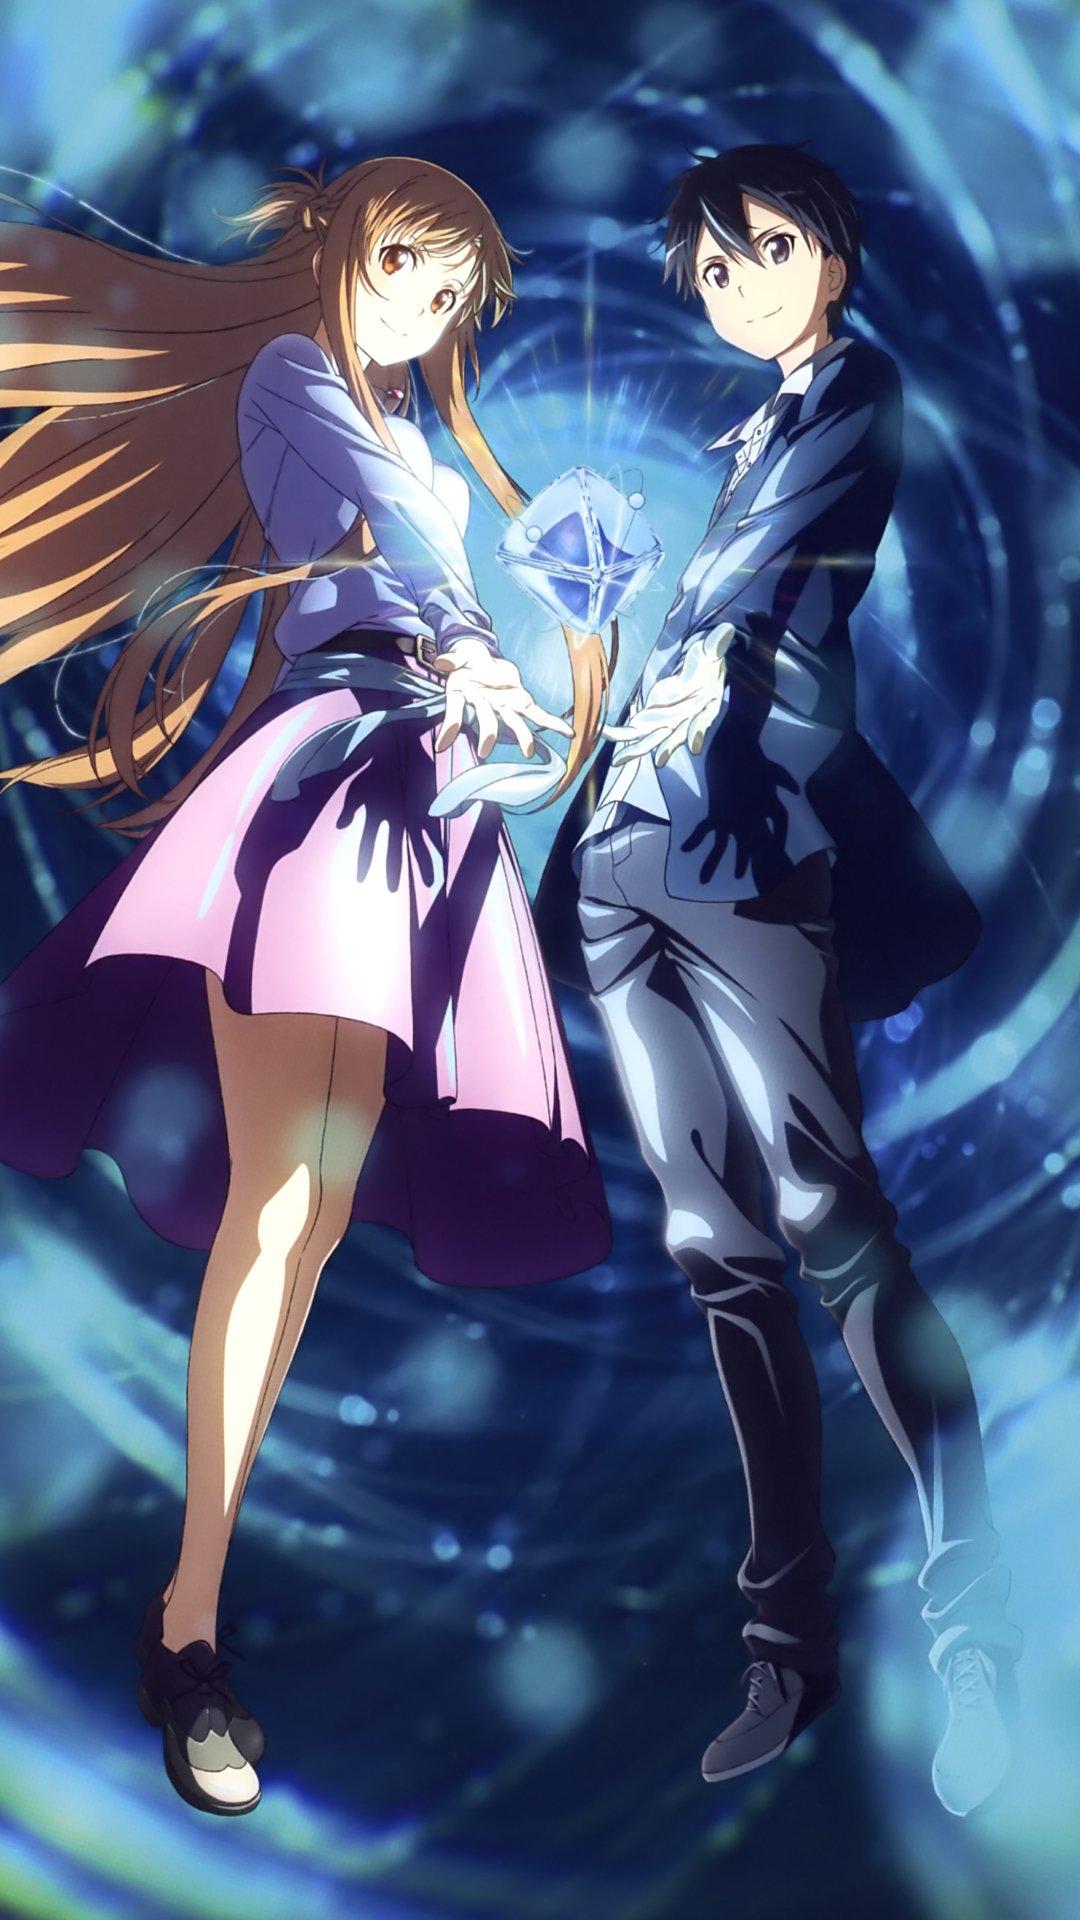 Sword Art Online Alicization Asuna Kirito 1080×1920 ...